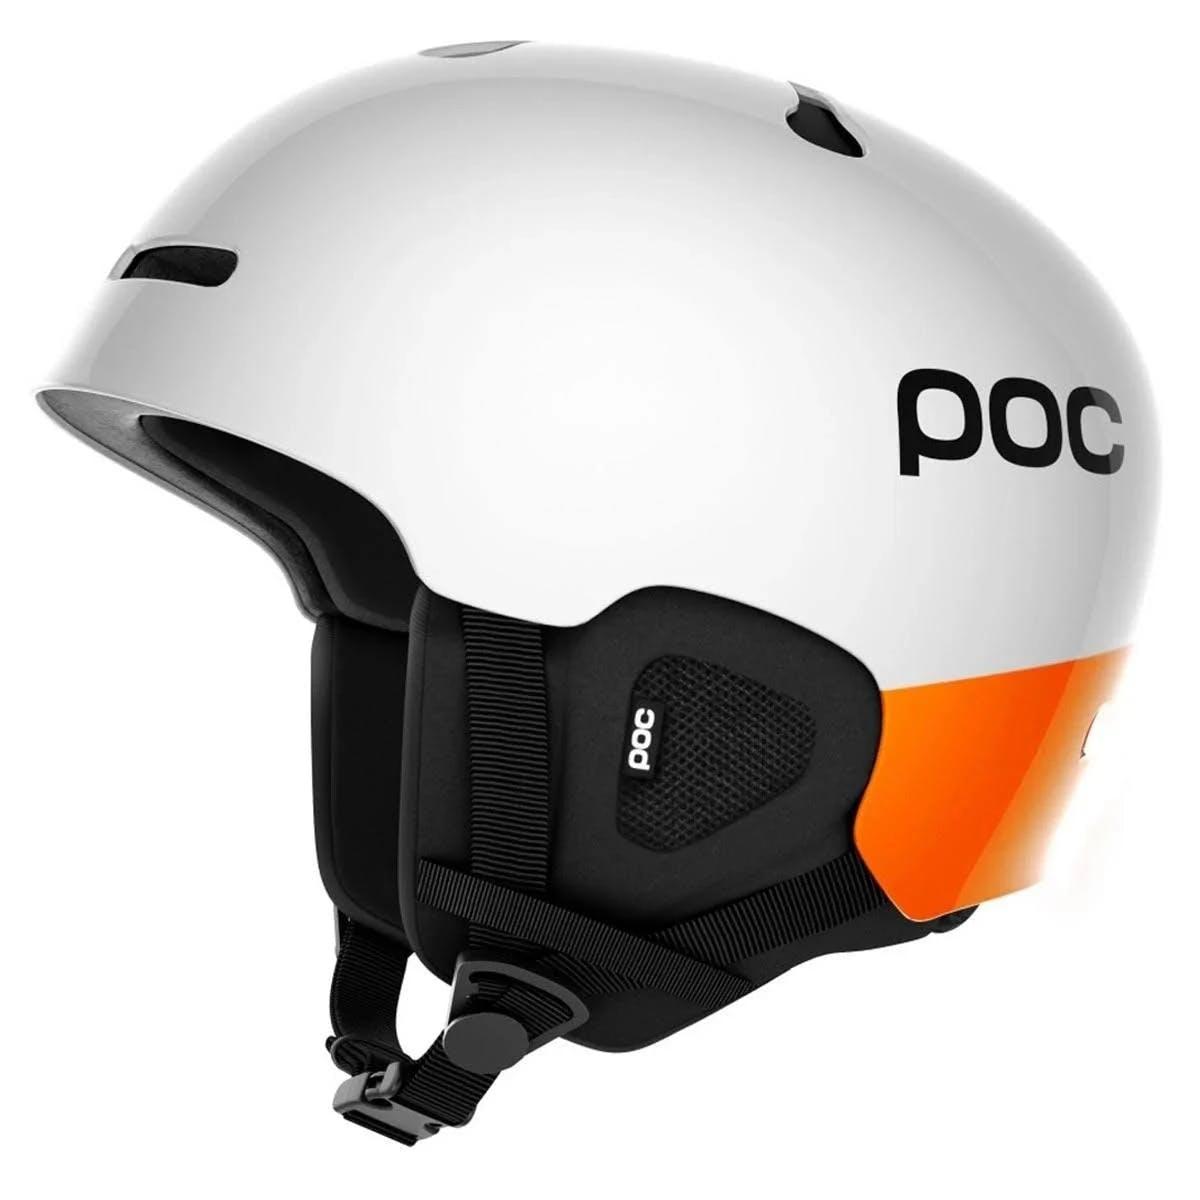 POC Auric Cut Originals Snow/winter Sports Helmet